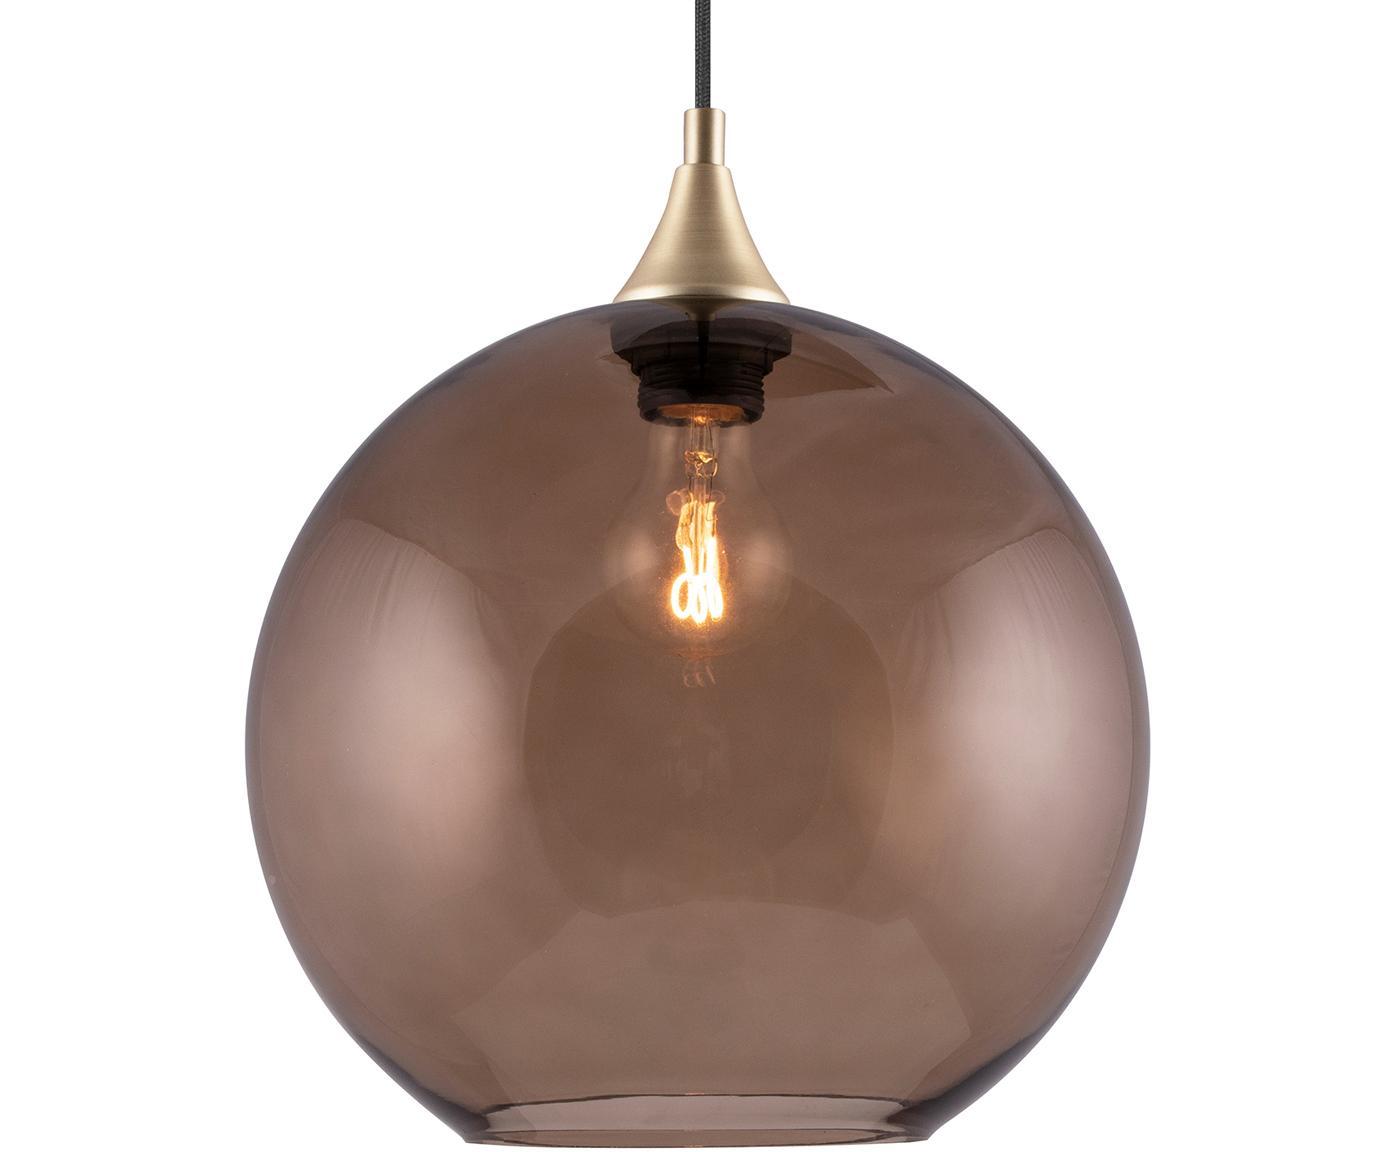 Kugel-Pendelleuchte Bowl aus Glas, Glas, Metall, Braun, transparent, Ø 28 x H 32 cm